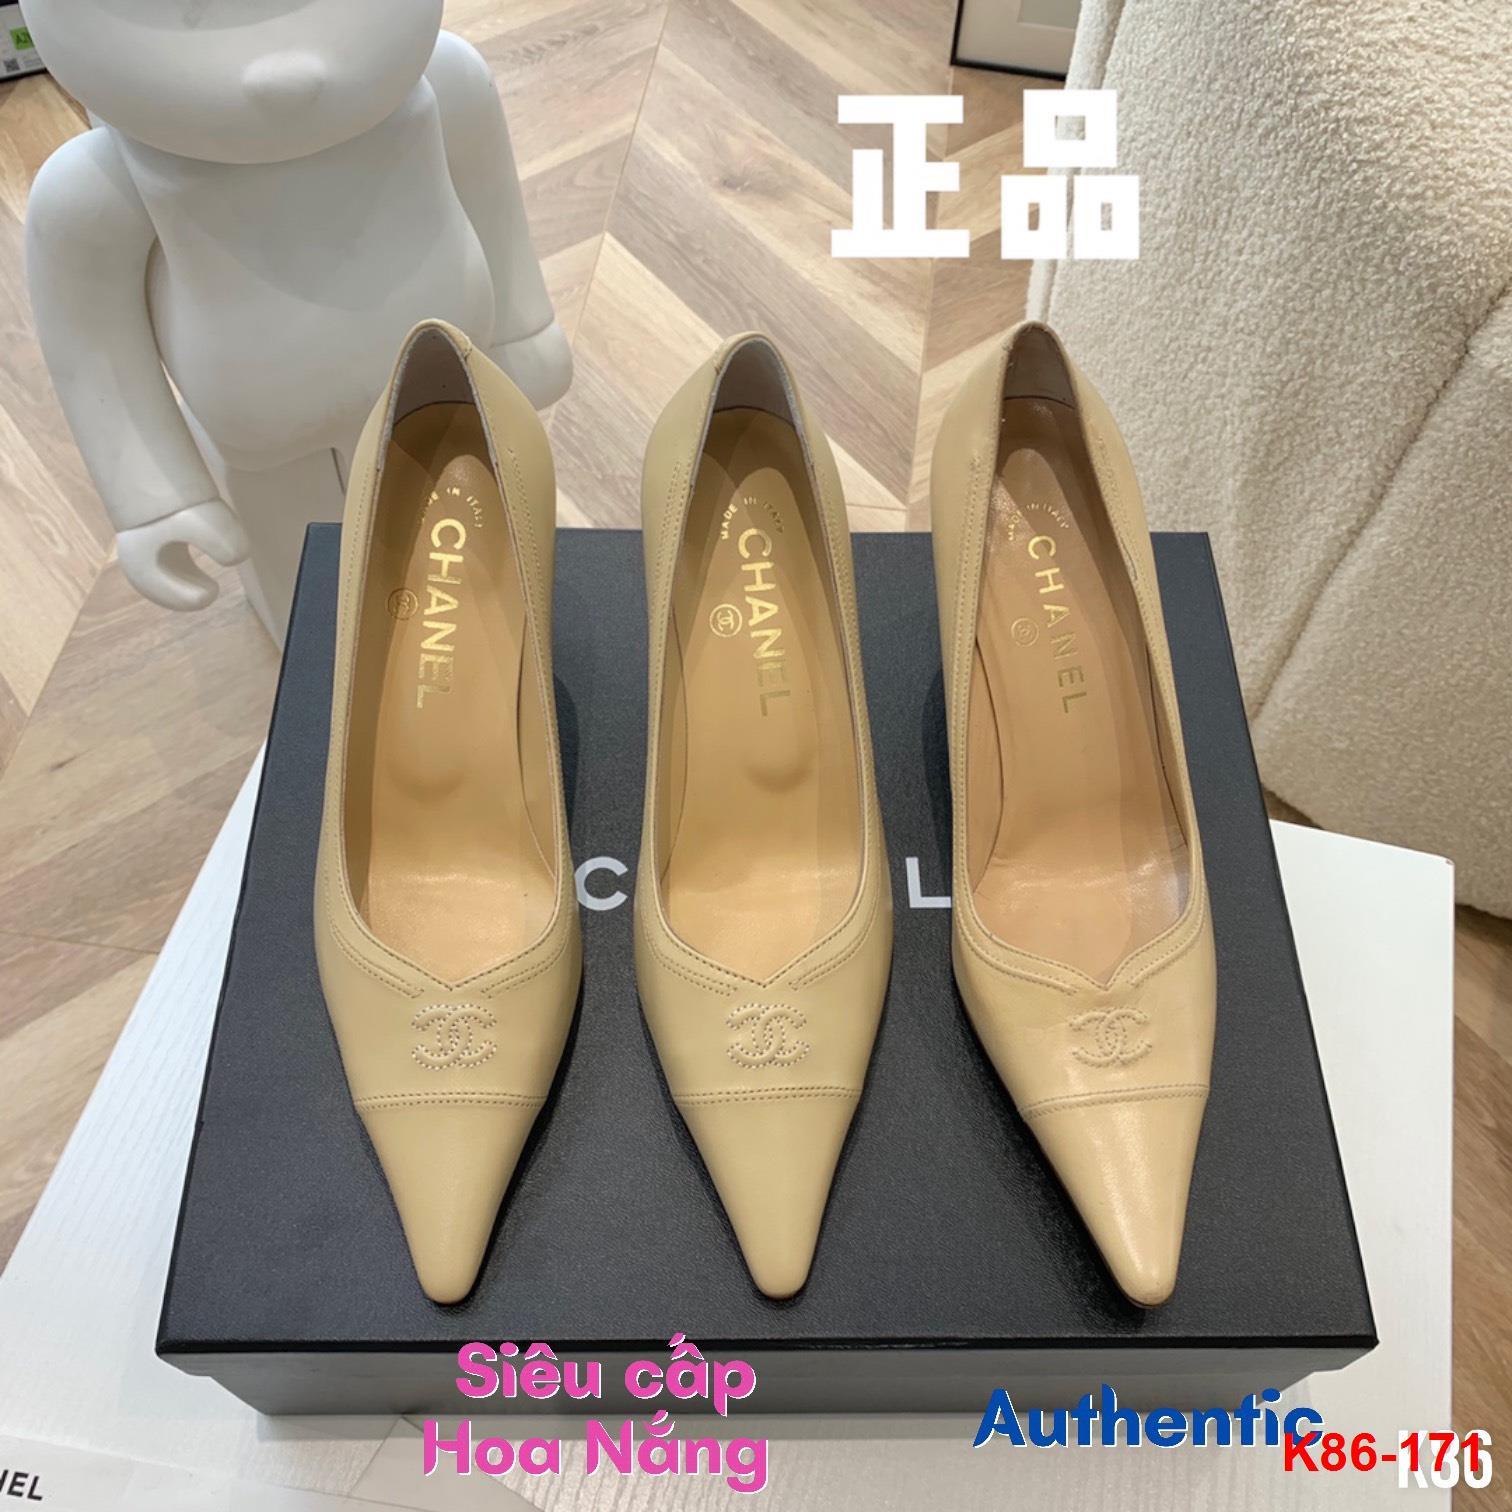 K86-171 Chanel giày cao 8cm siêu cấp